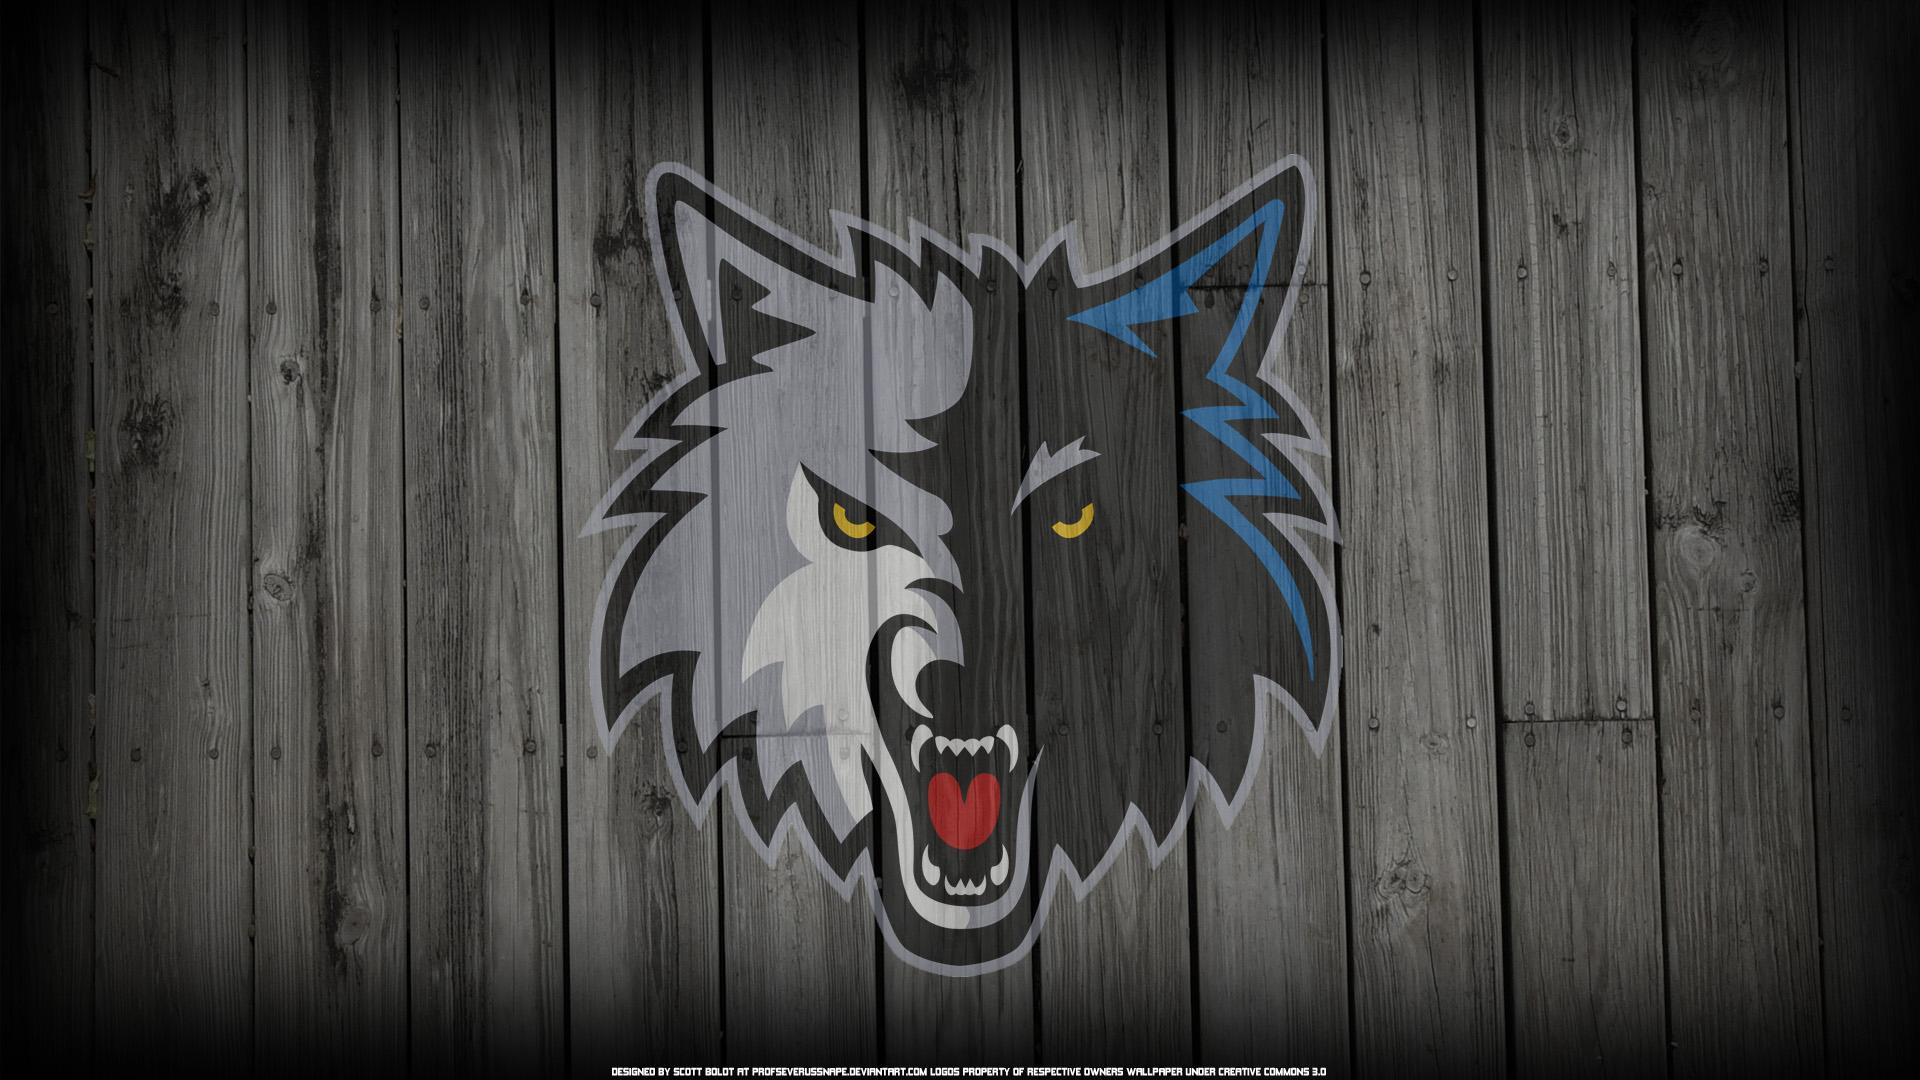 Minnesota timberwolves logo wallpapers   SF Wallpaper 1920x1080